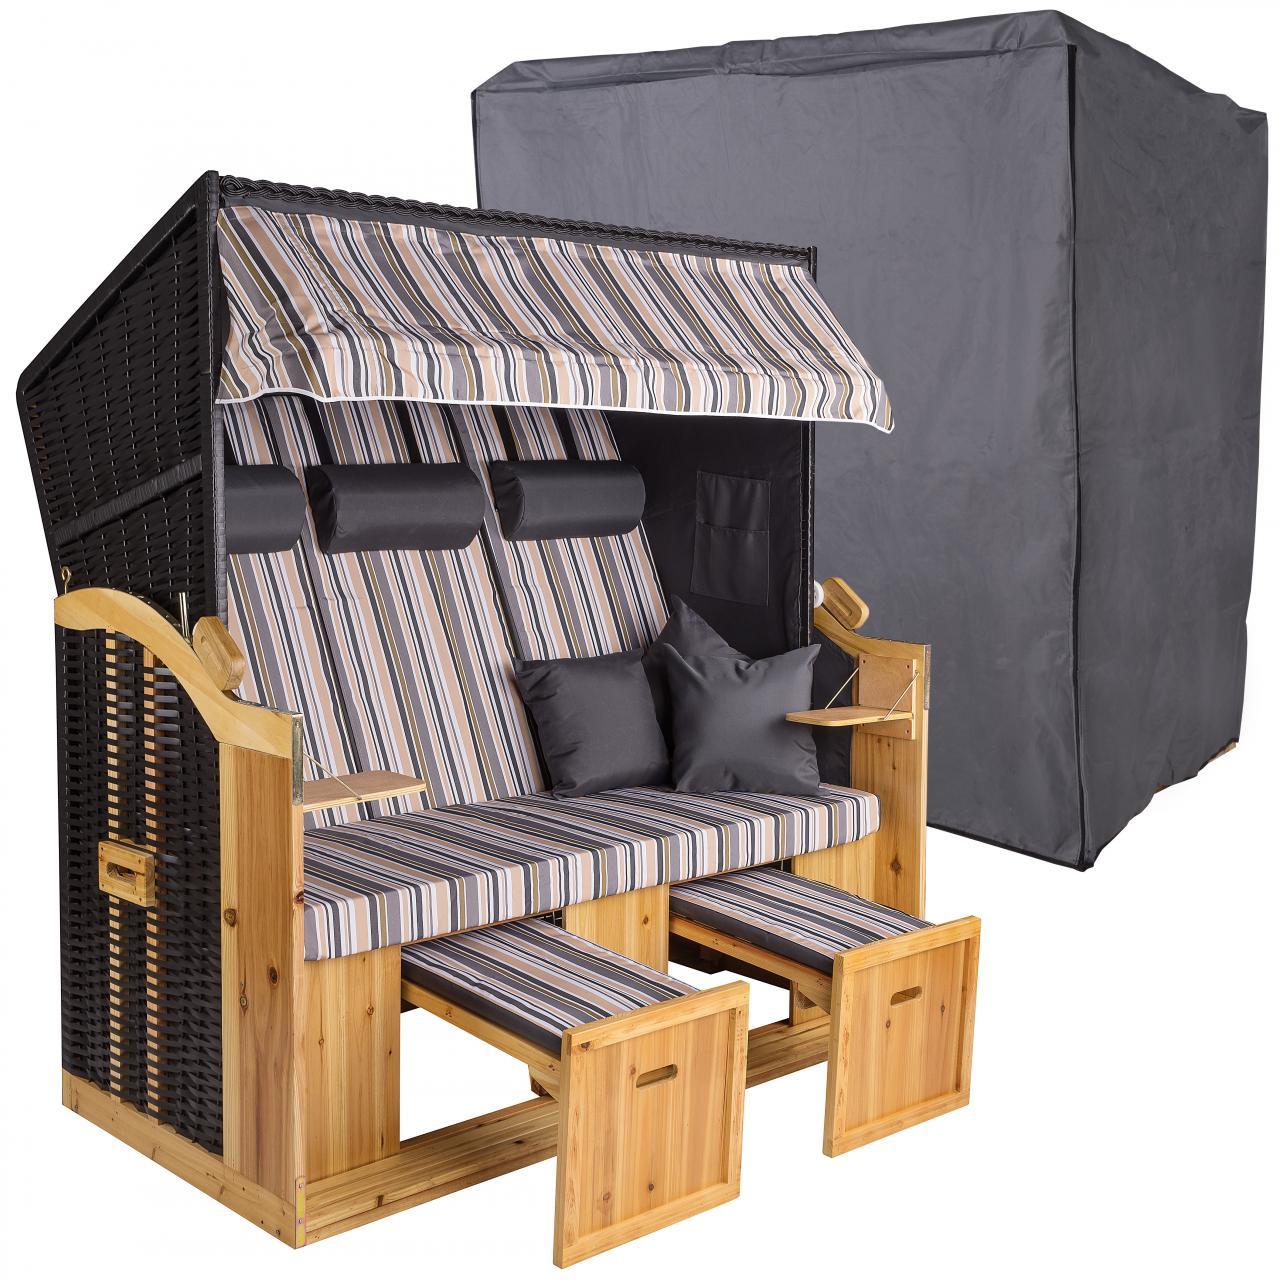 strandkorb xxl 160cm inklusive schutzh lle 600d volllieger ostsee gartenm bel ebay. Black Bedroom Furniture Sets. Home Design Ideas